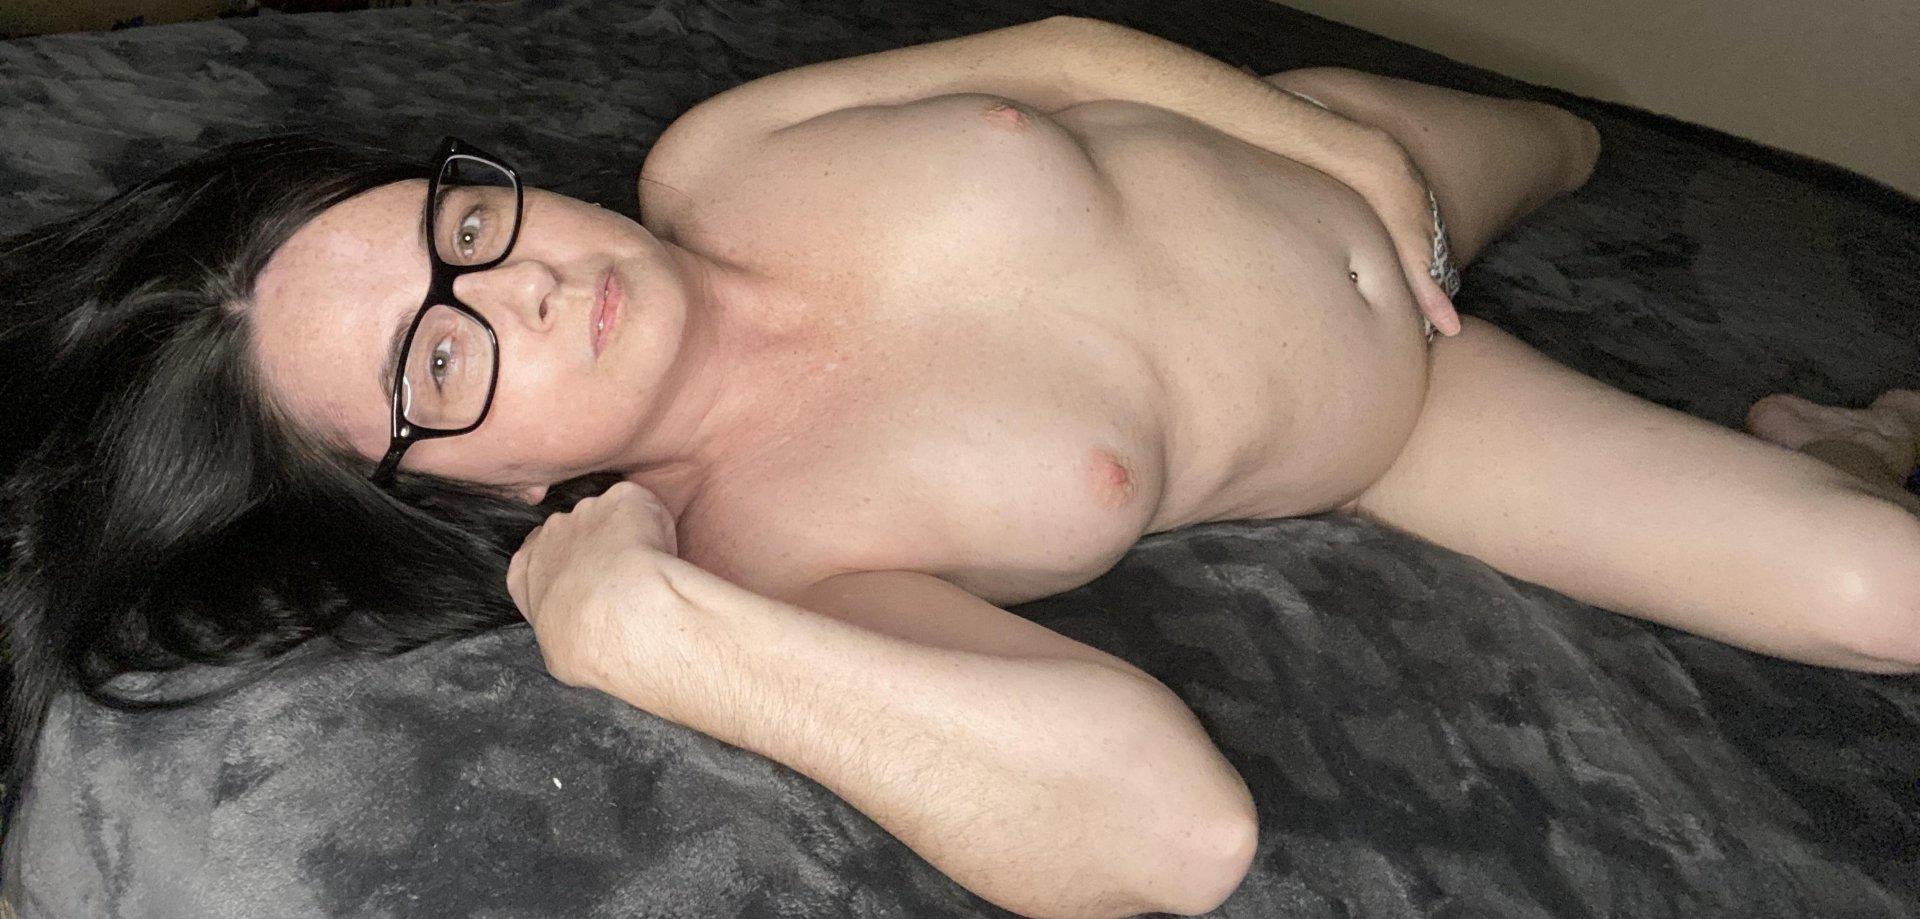 MrsExtinctBabe from Vale of Glamorgan,United Kingdom